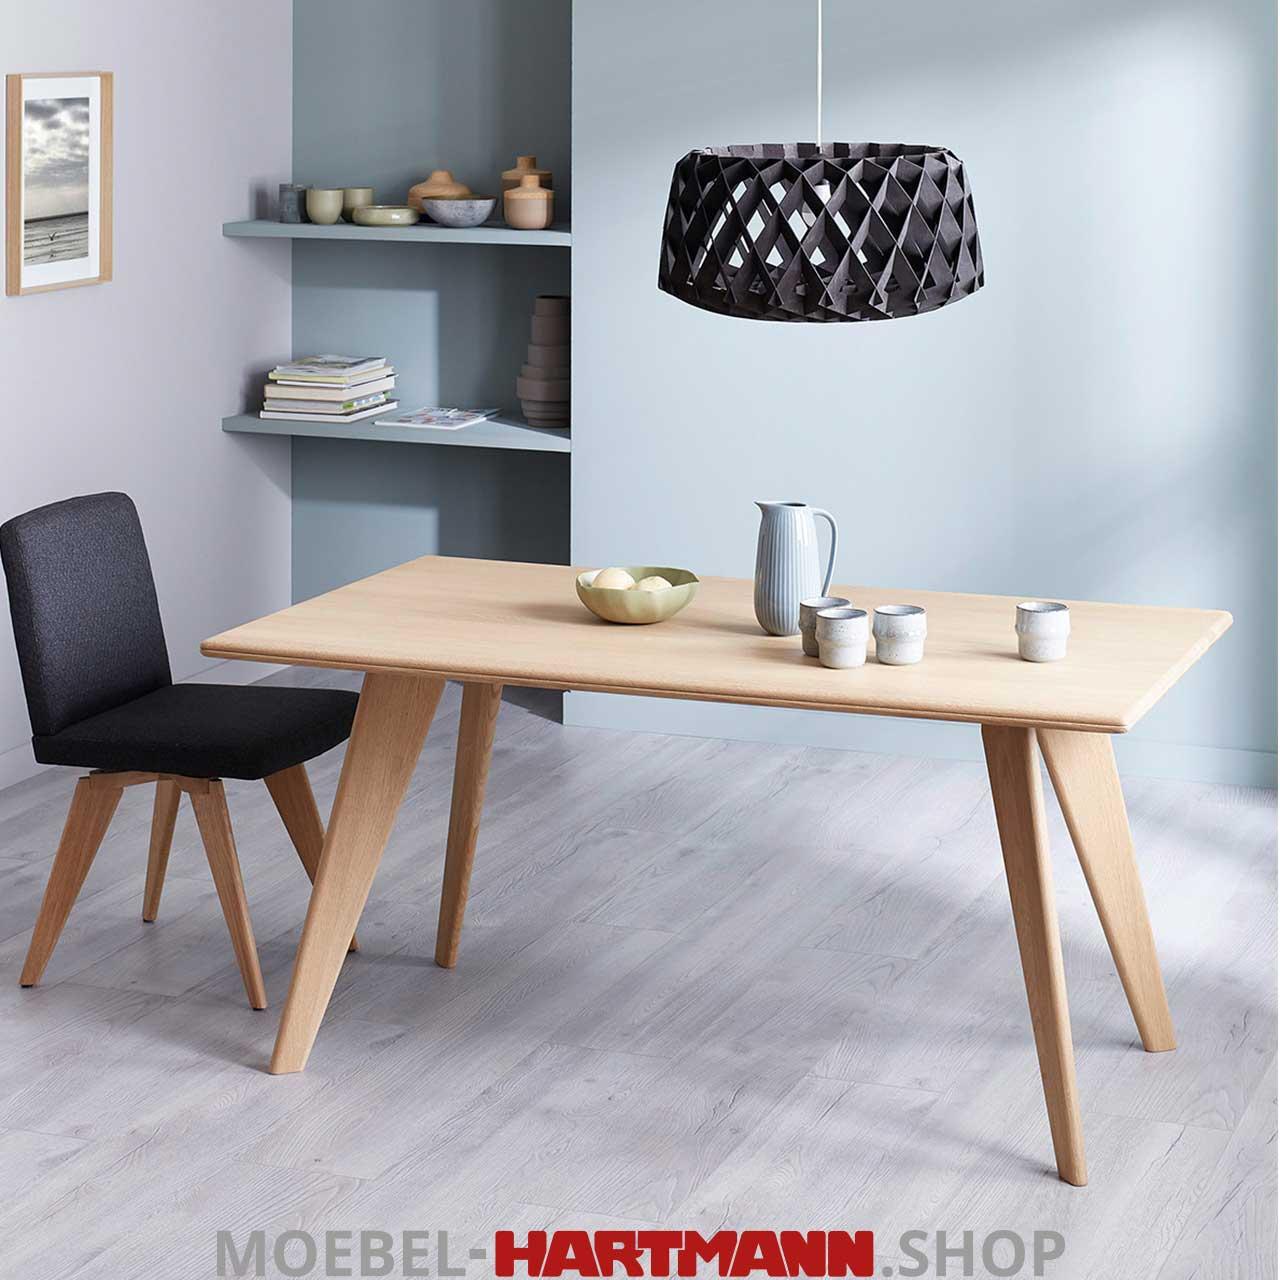 Moebel-hartmann.shop